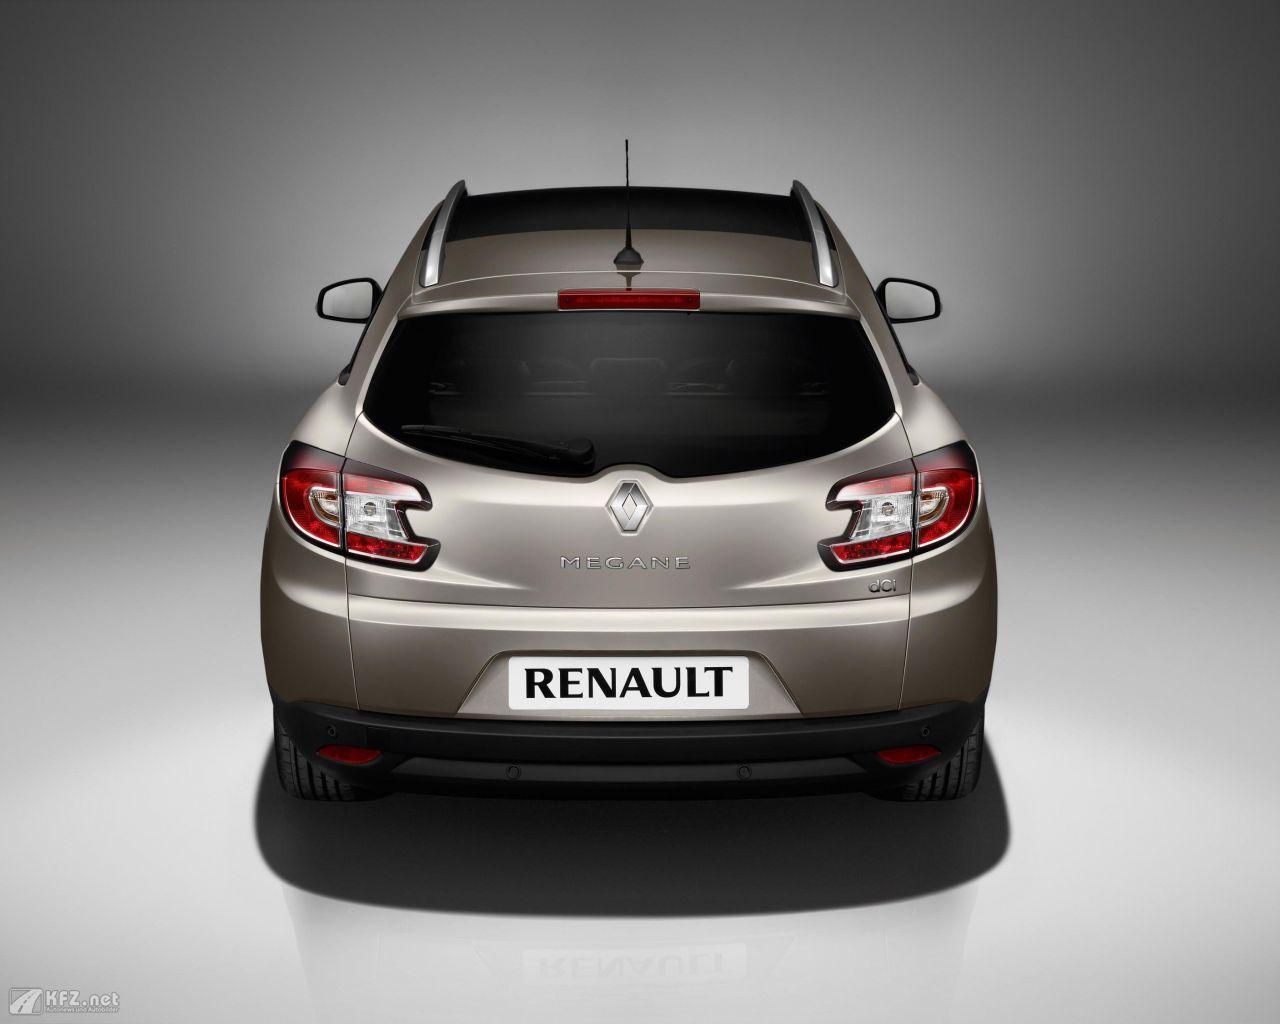 renault-megane-1280x1024-8